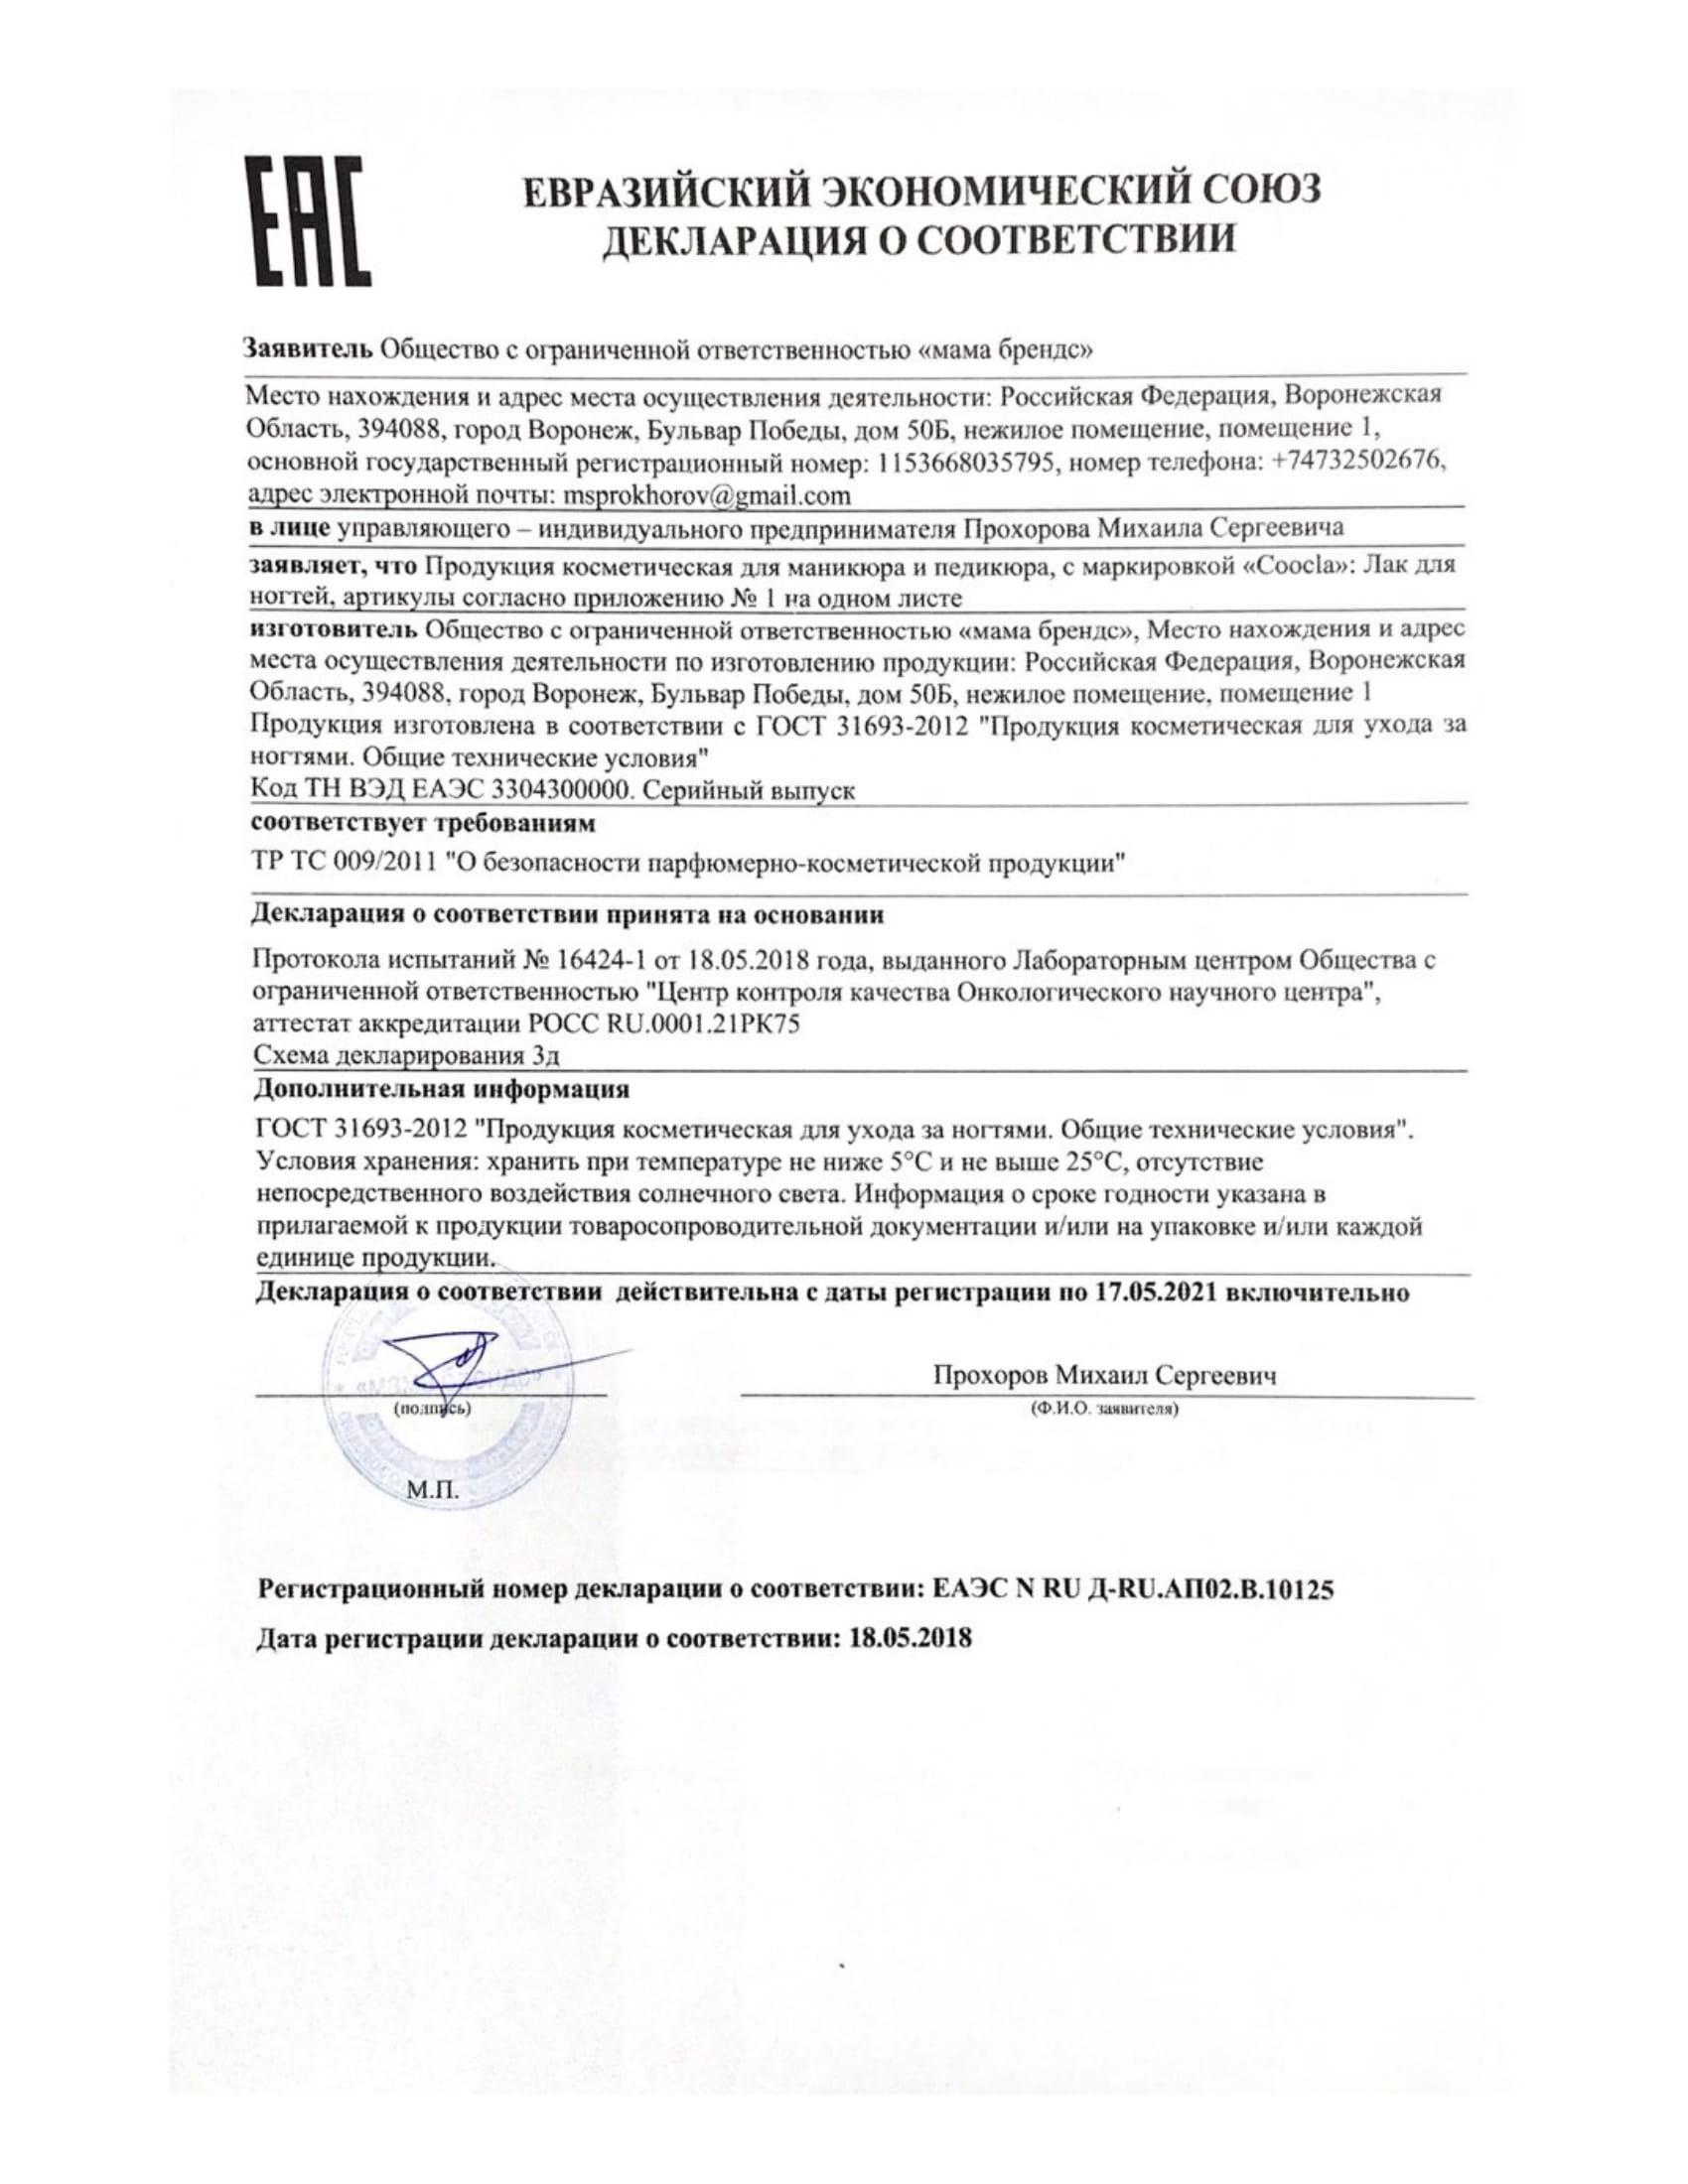 ЕАЭС N RU Д-RU.АП02.В.10125-1